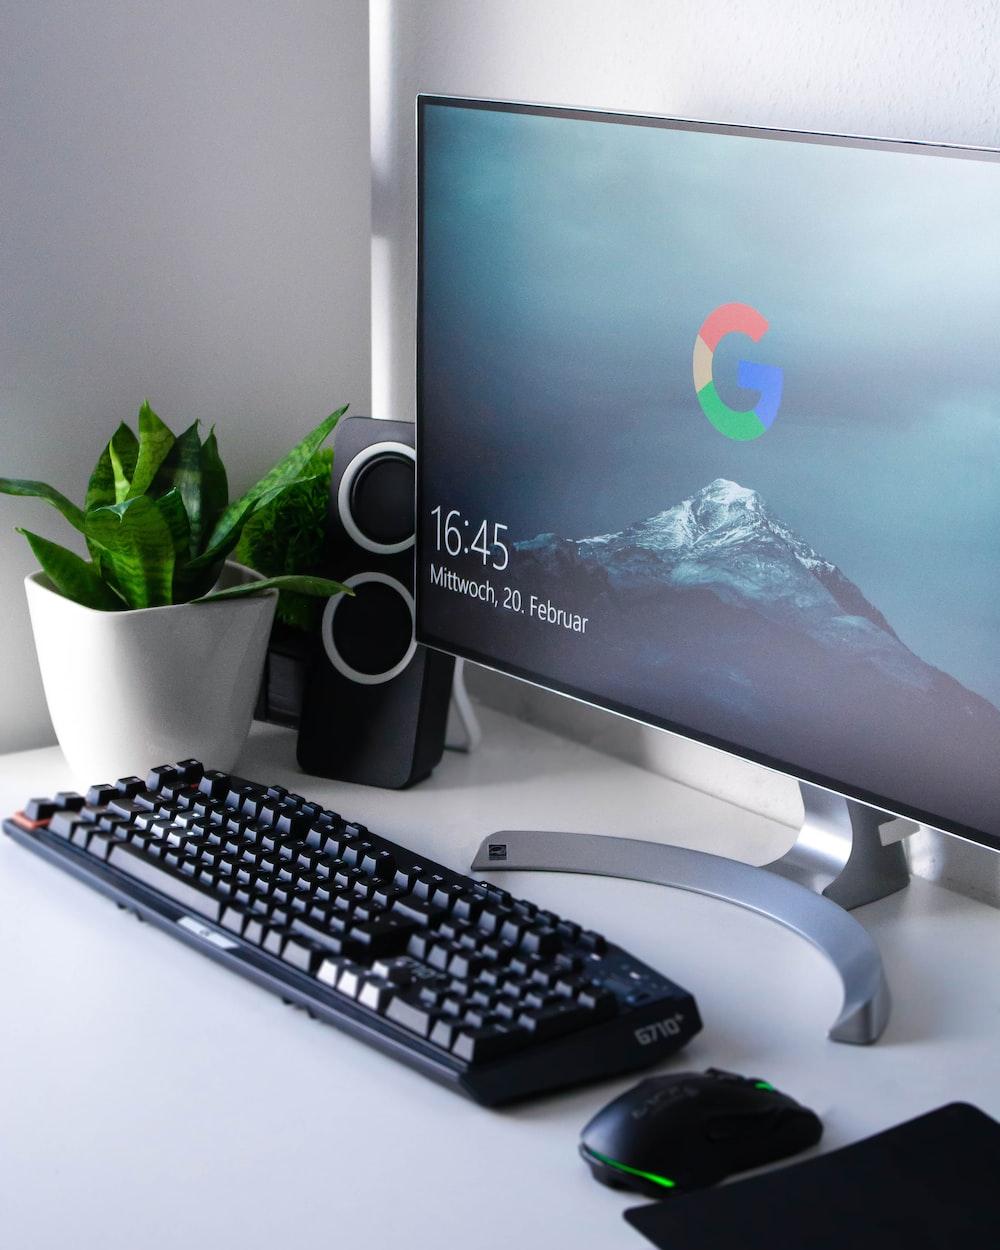 750 Computer Images Download Free Images On Unsplash